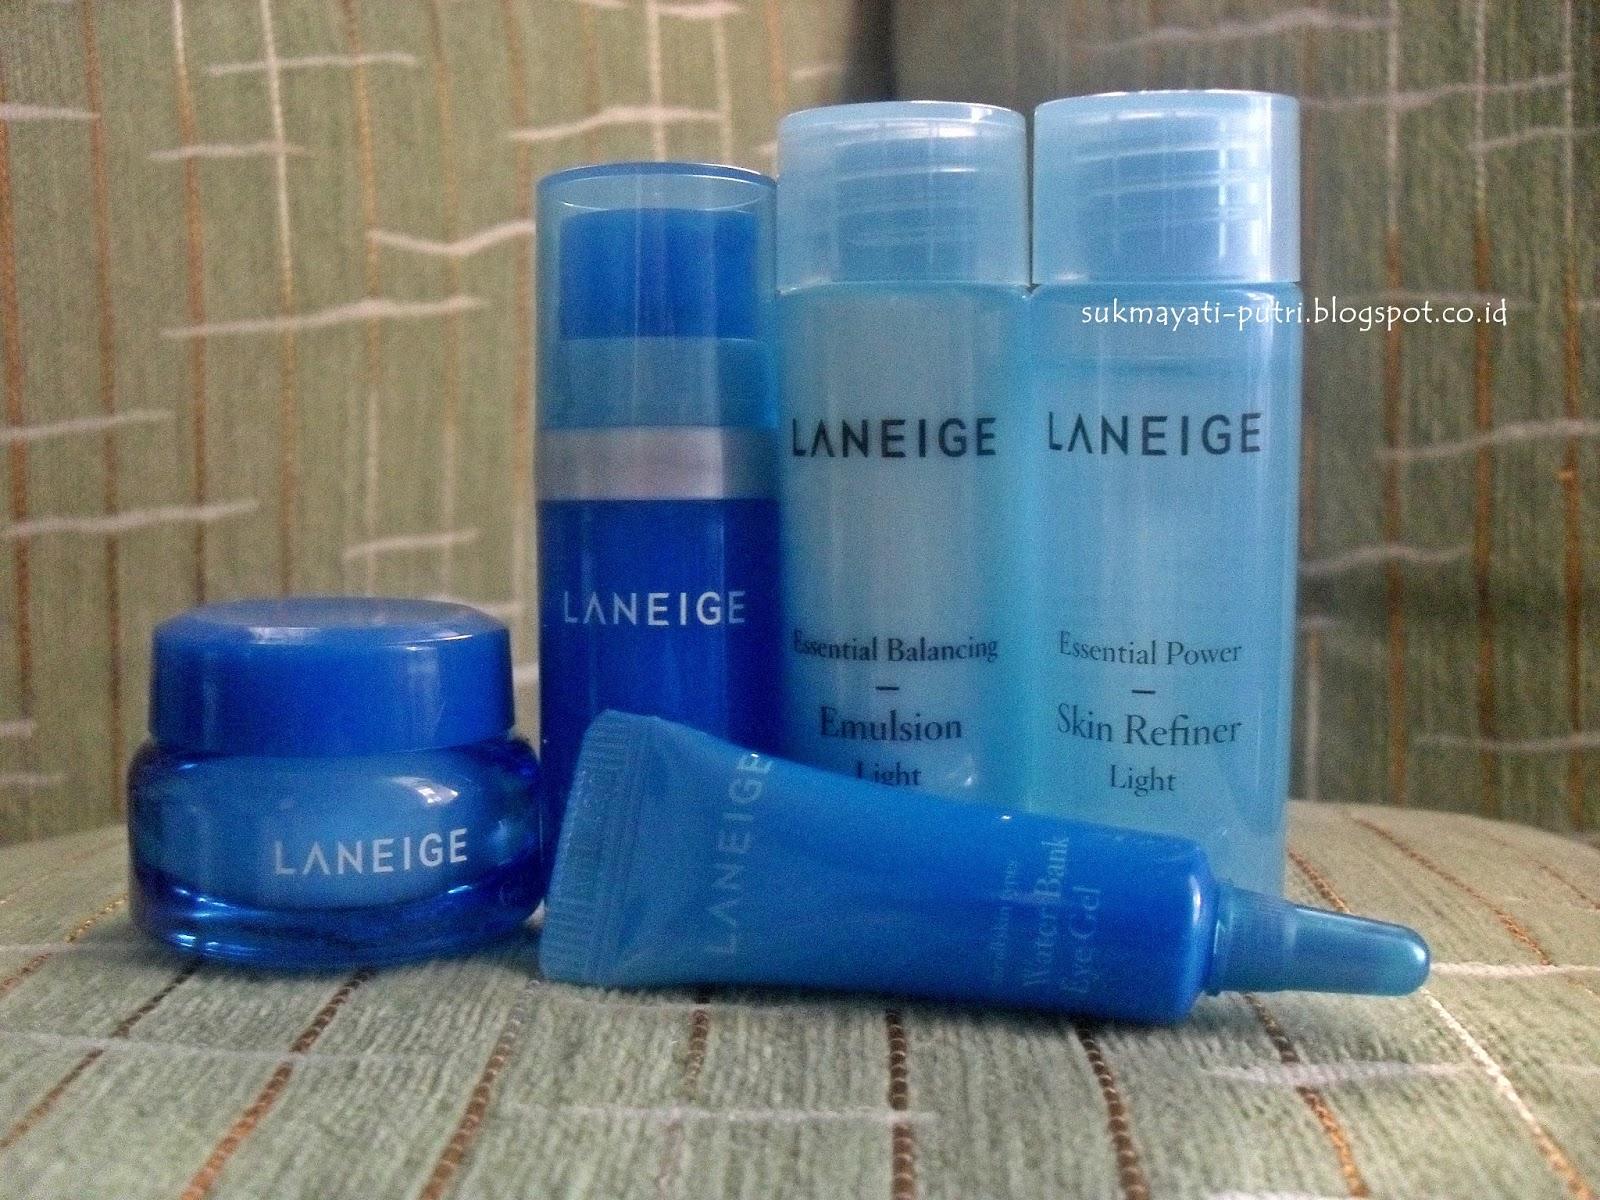 Review Laneige Basic New Water Bank Refreshing Kit Be You Tiful Set Paket A Berisi 5 Produk Dan Ini Ternyata Memang Khusus Buat Yang Punya Combination To Oily Skin Aku Kulit Super Duper Teamhinyai Merasa